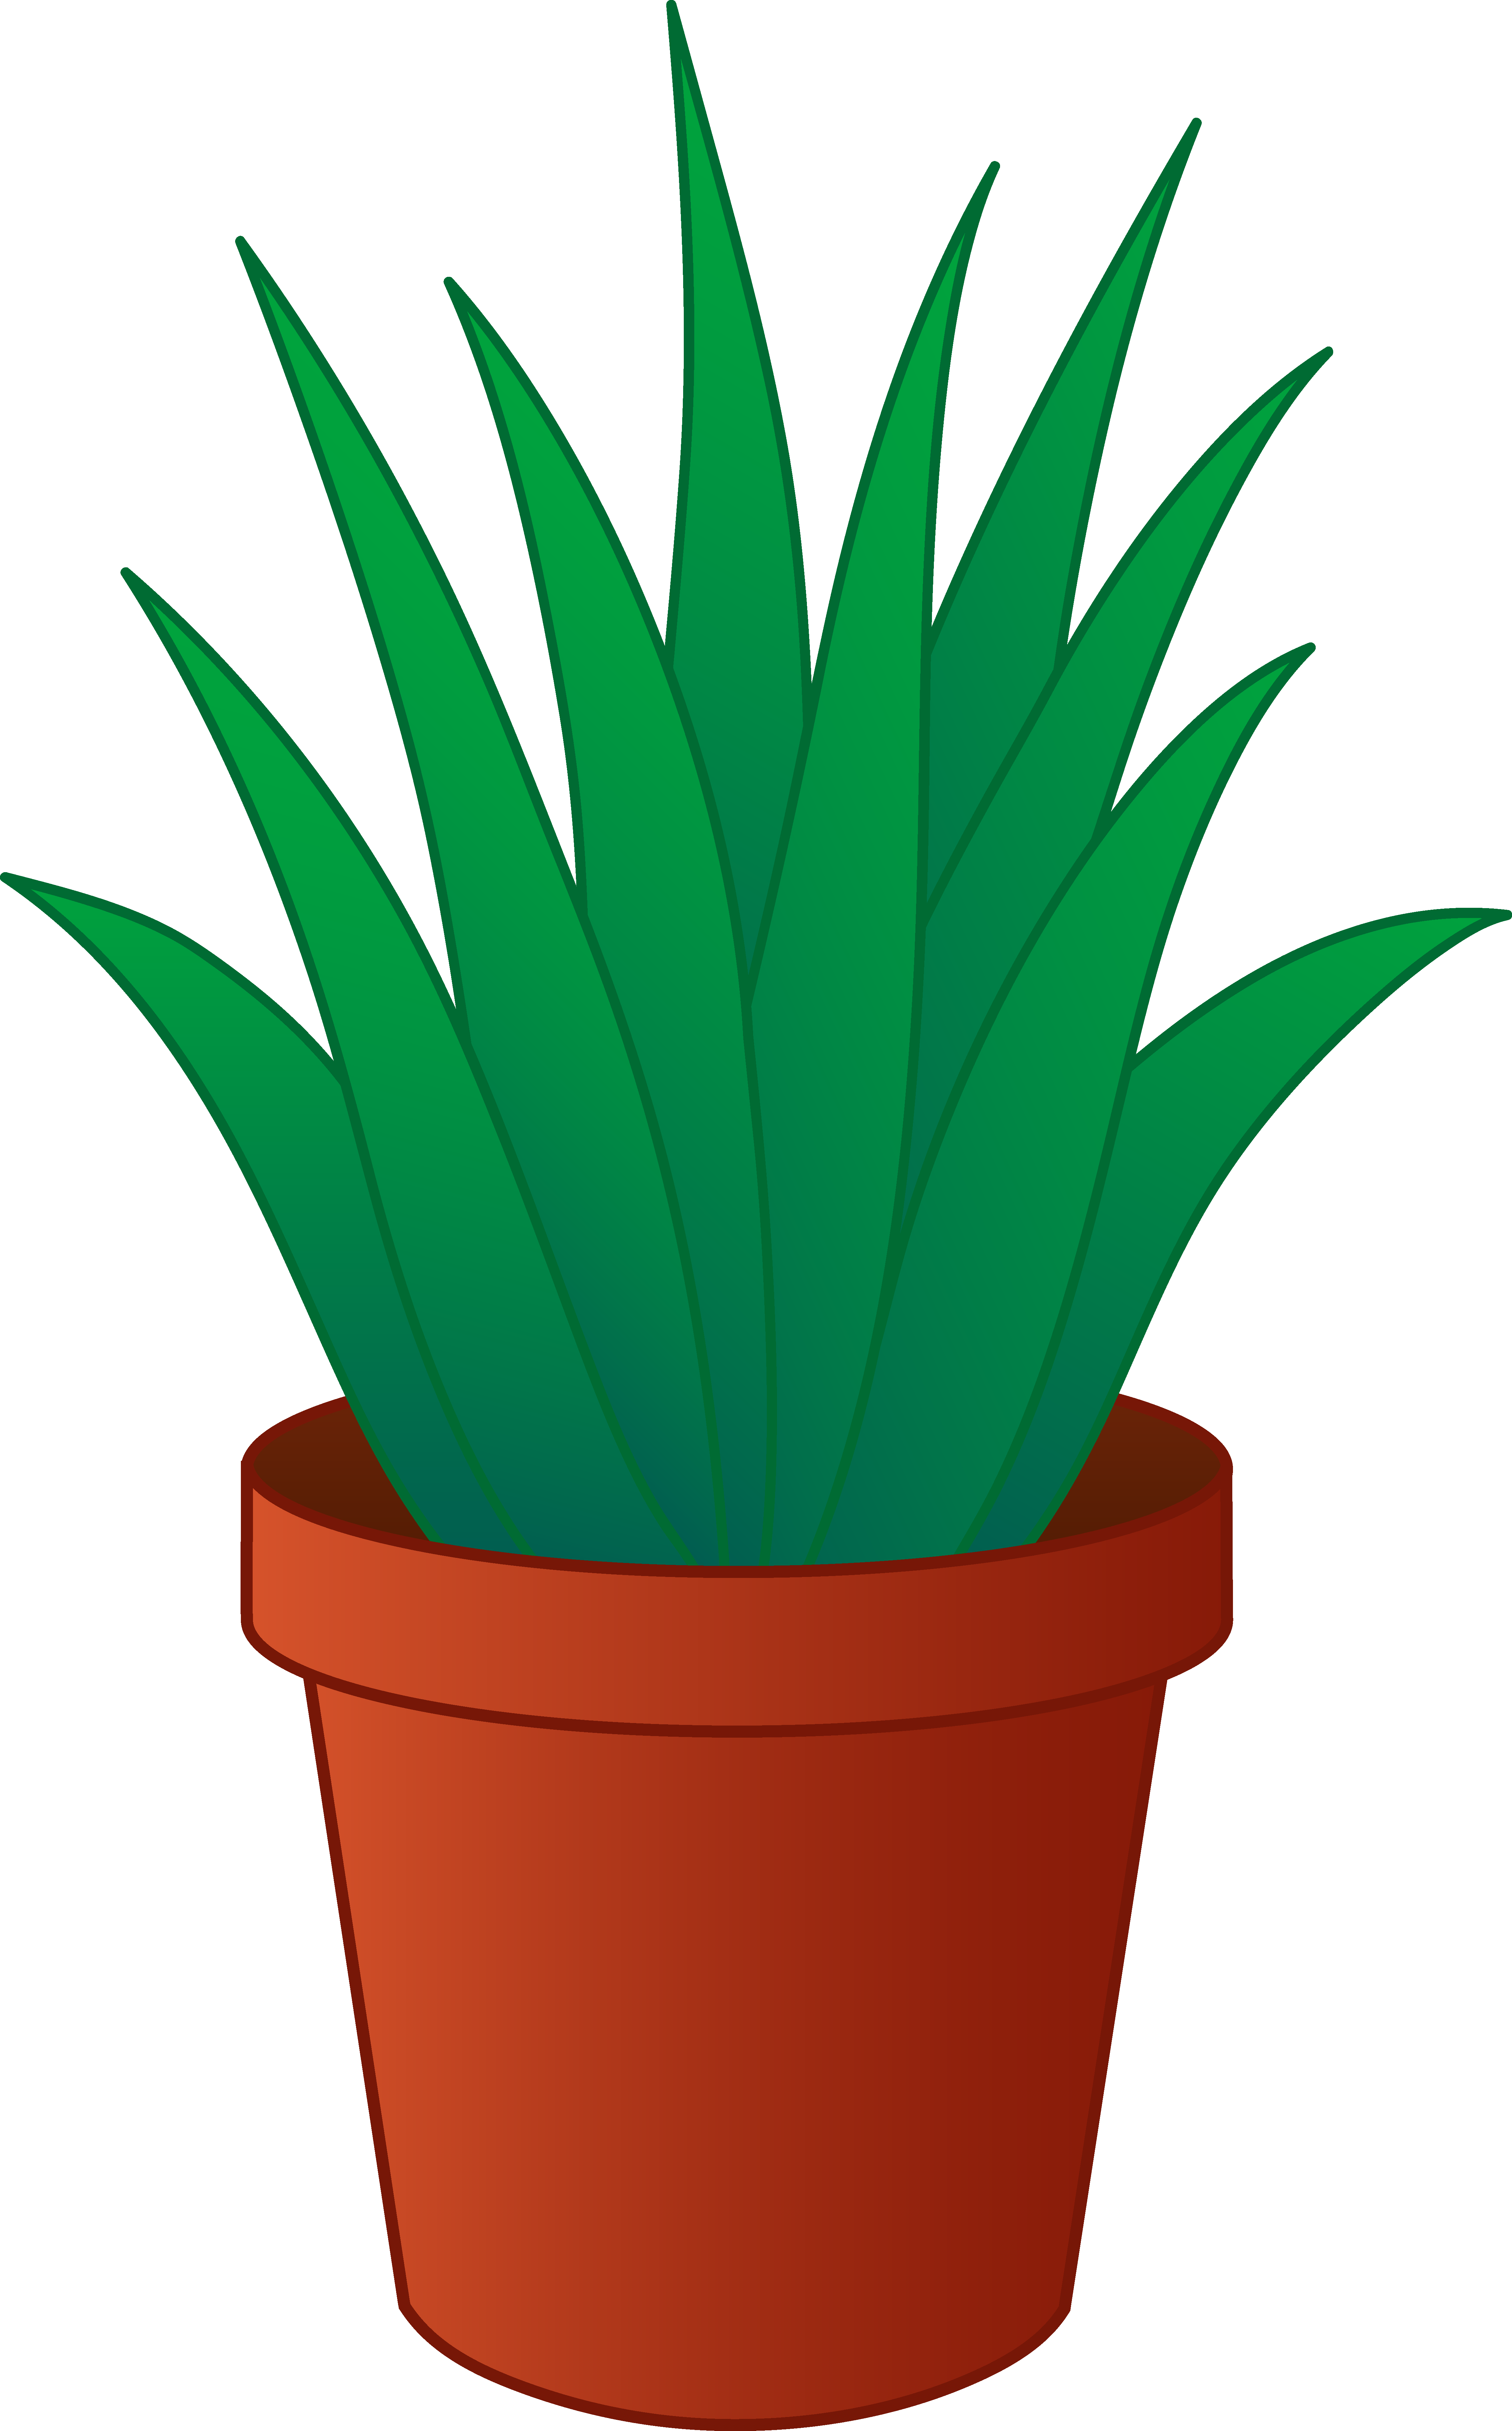 Aloe Vera Plant in Pot.